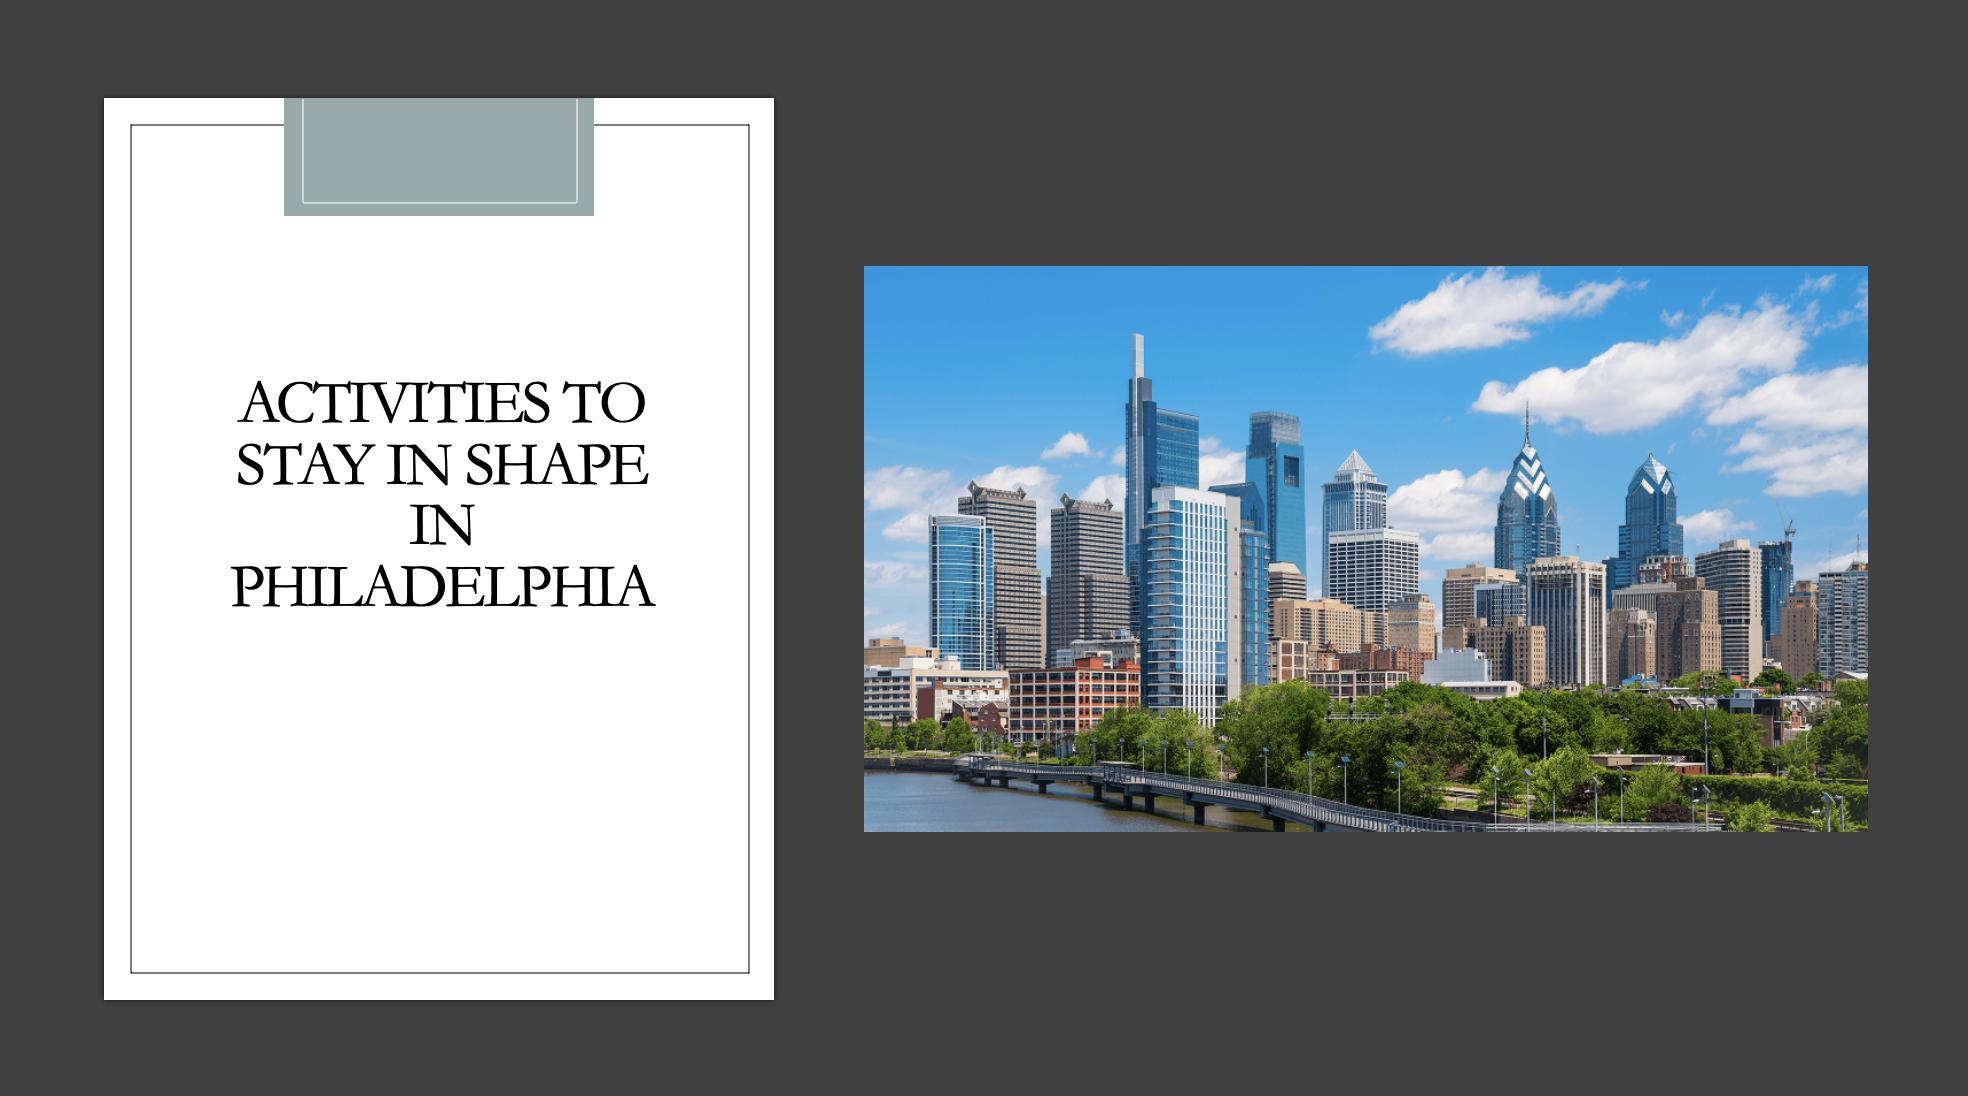 Activities to stay in shape in Philadelphia